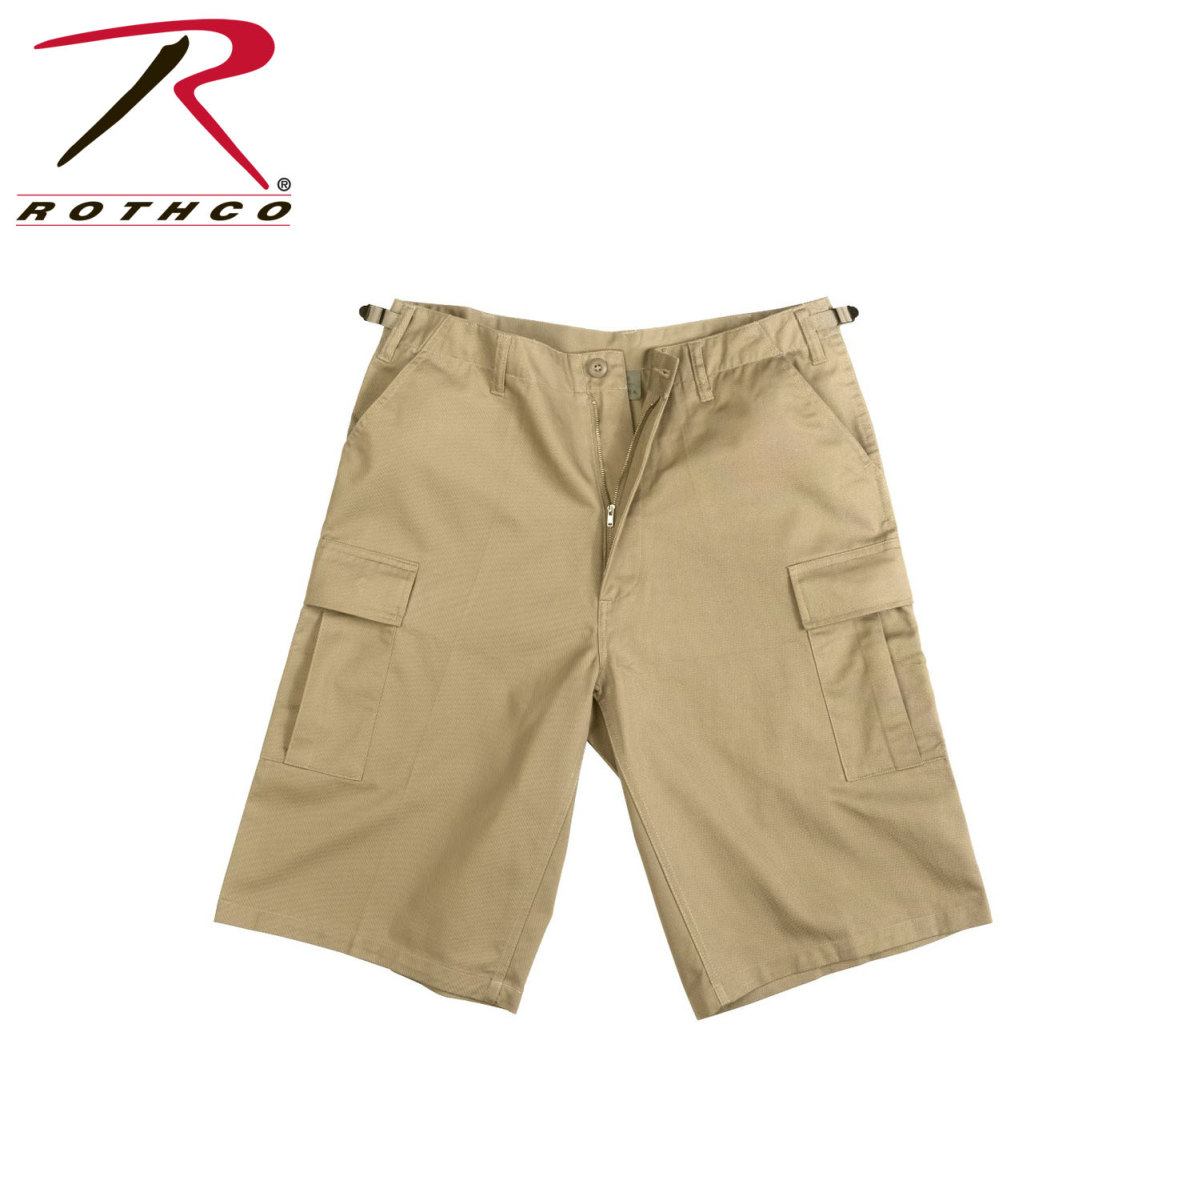 Longer Length Shorts